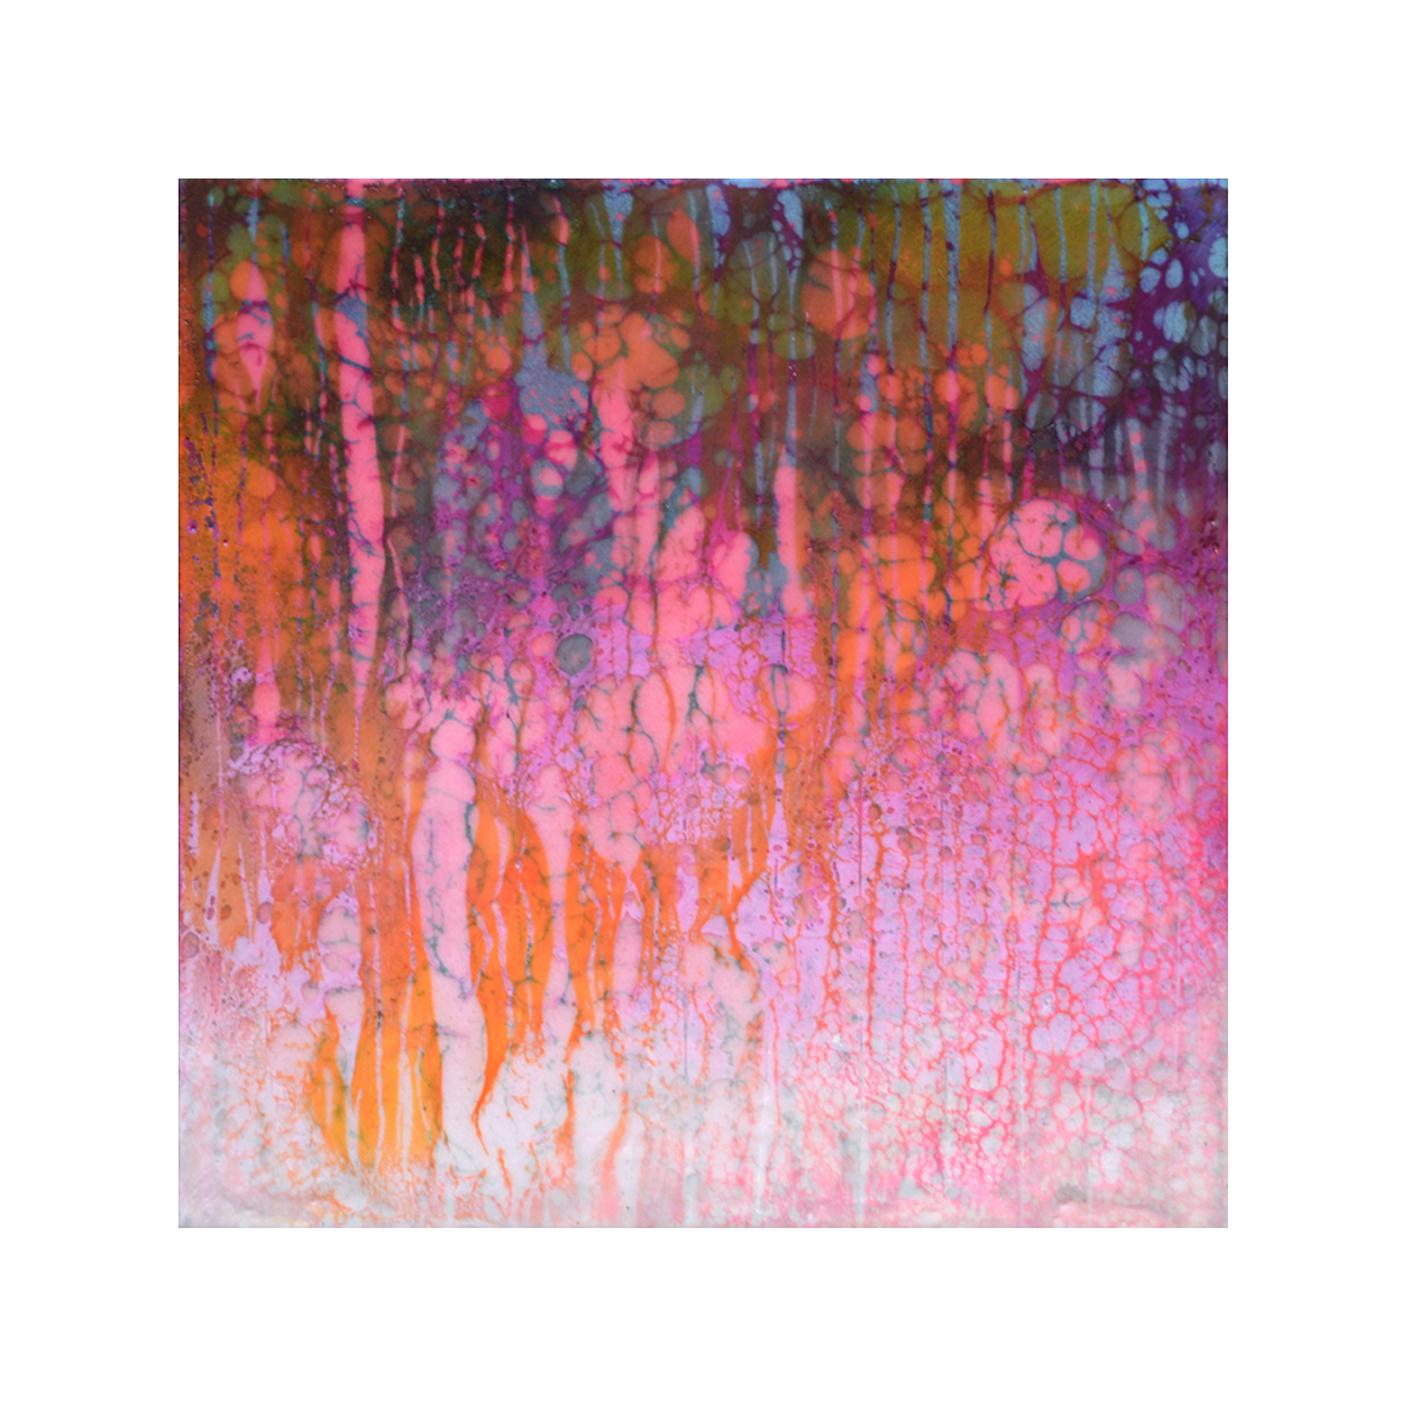 Rose Reverie   12 x 12  Encaustic on Panel  $300